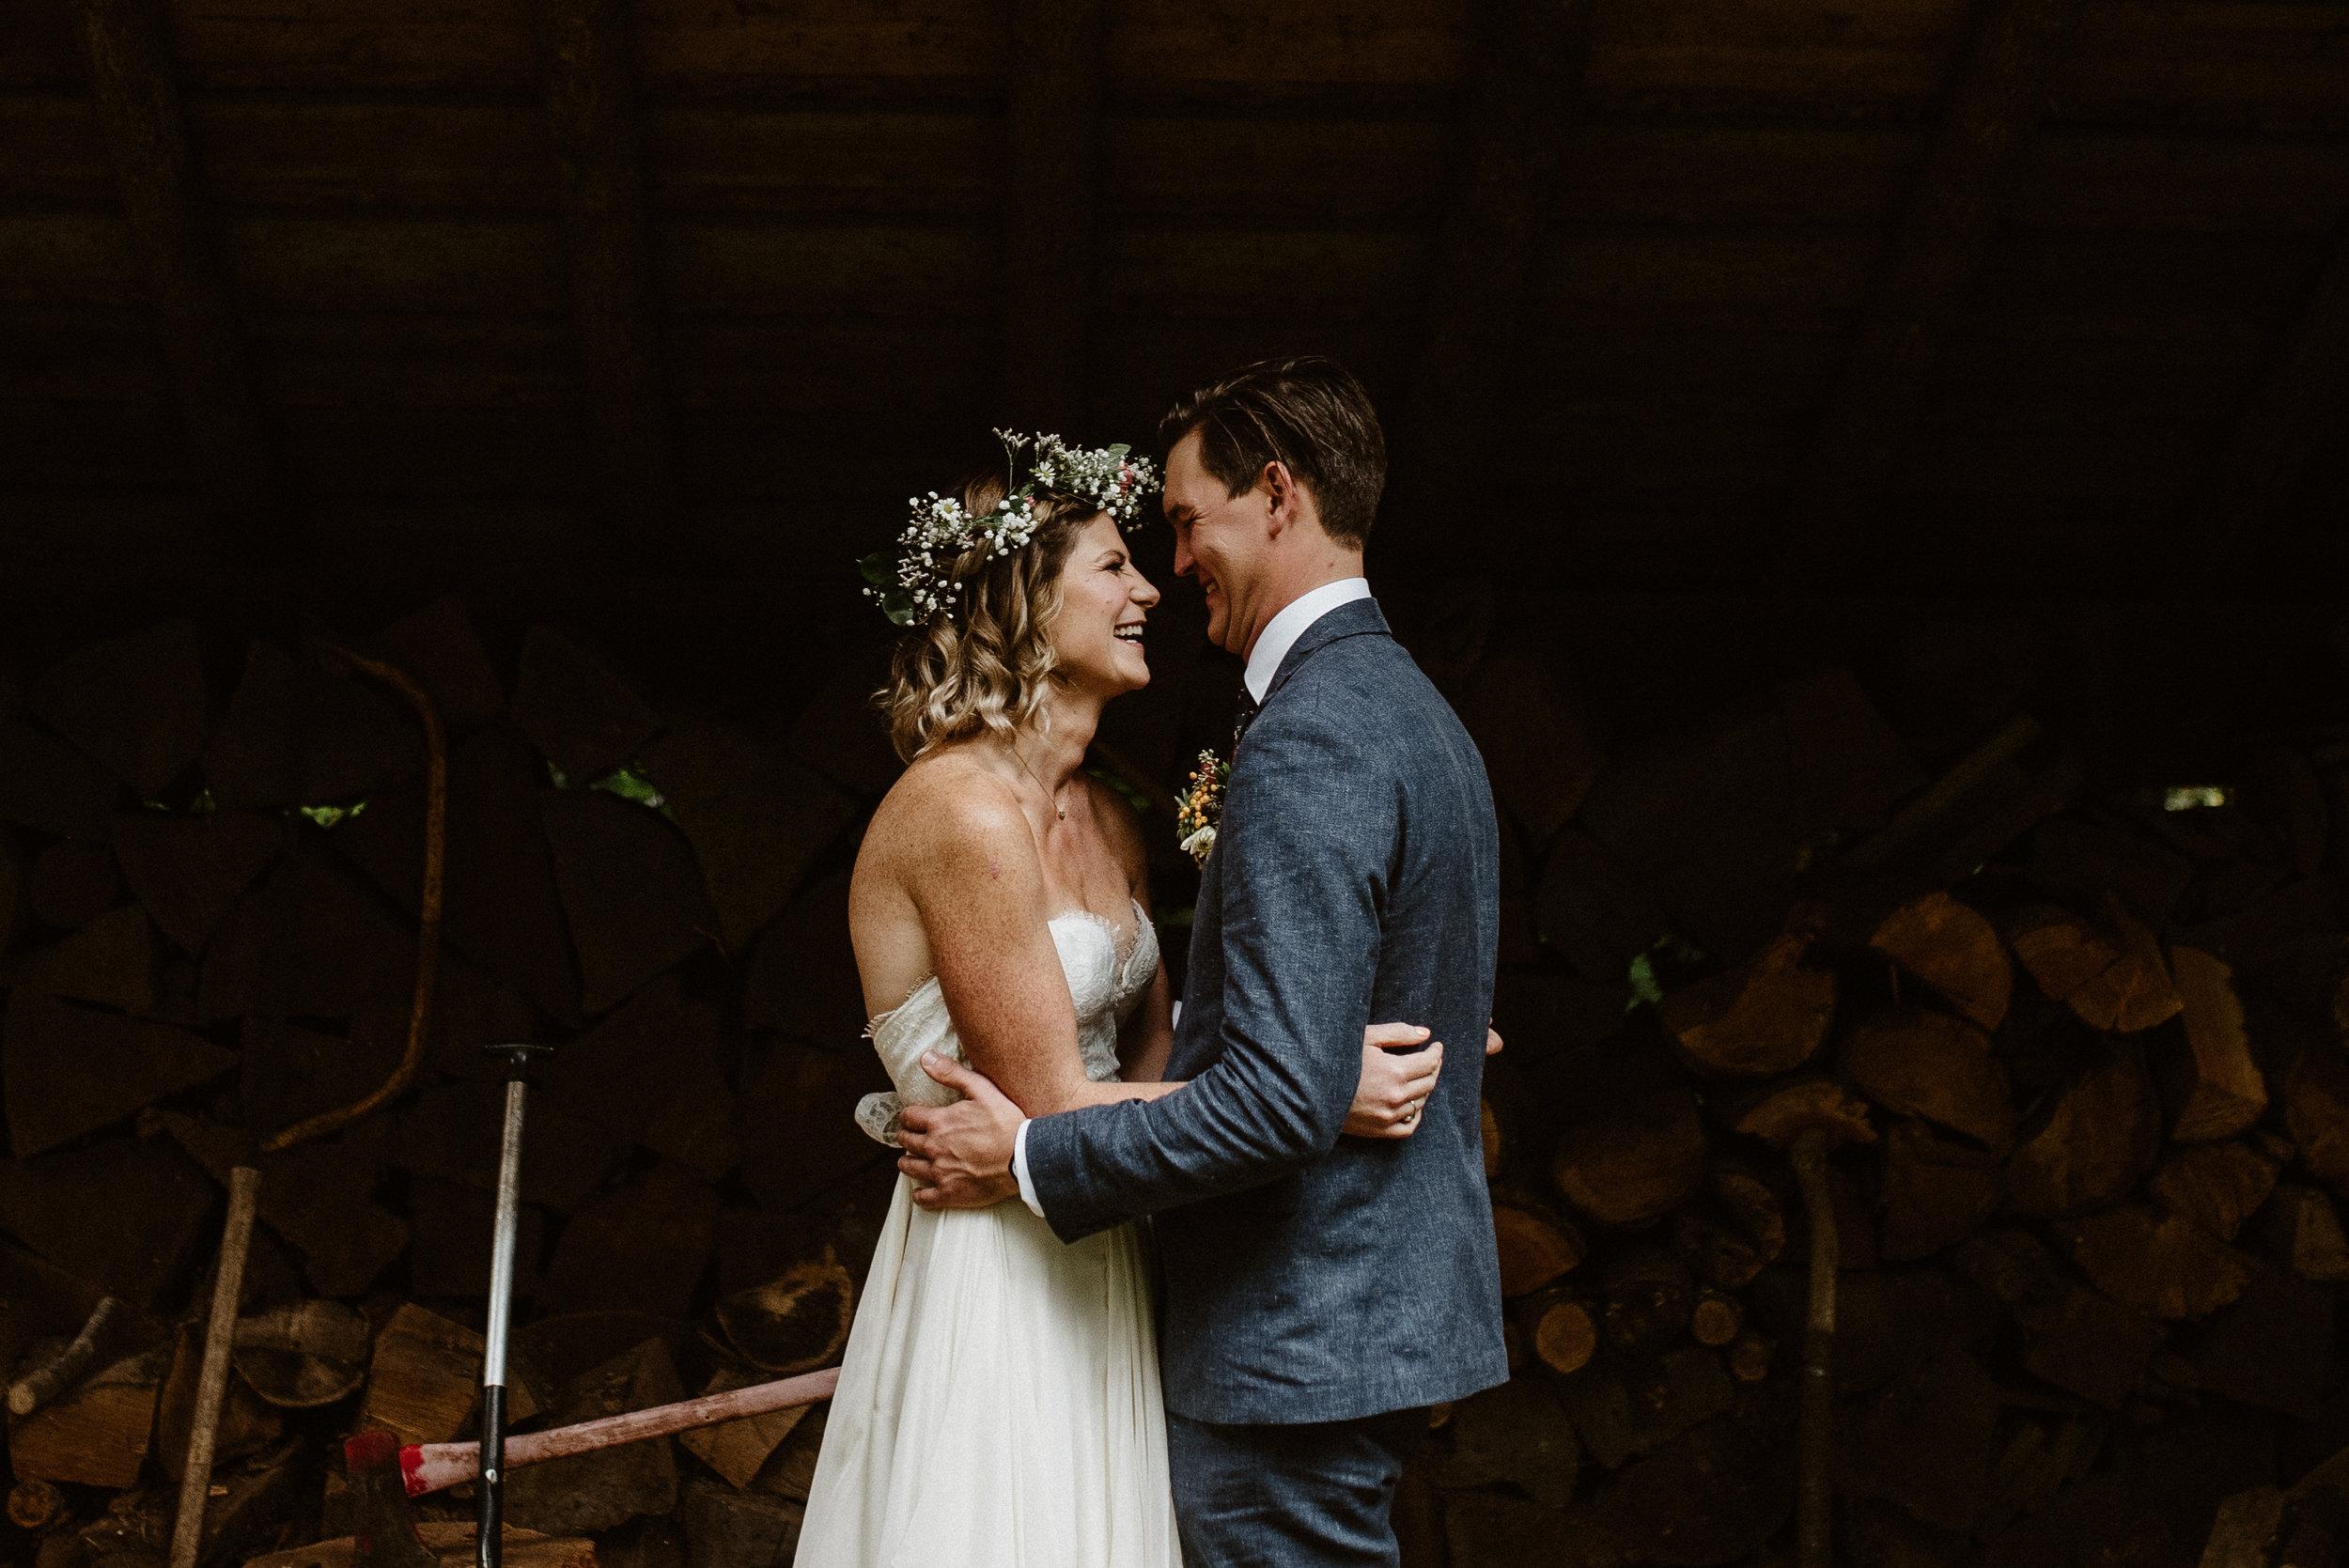 Zach + Shawnee  |  Wedding in the Woods Seattle, WA